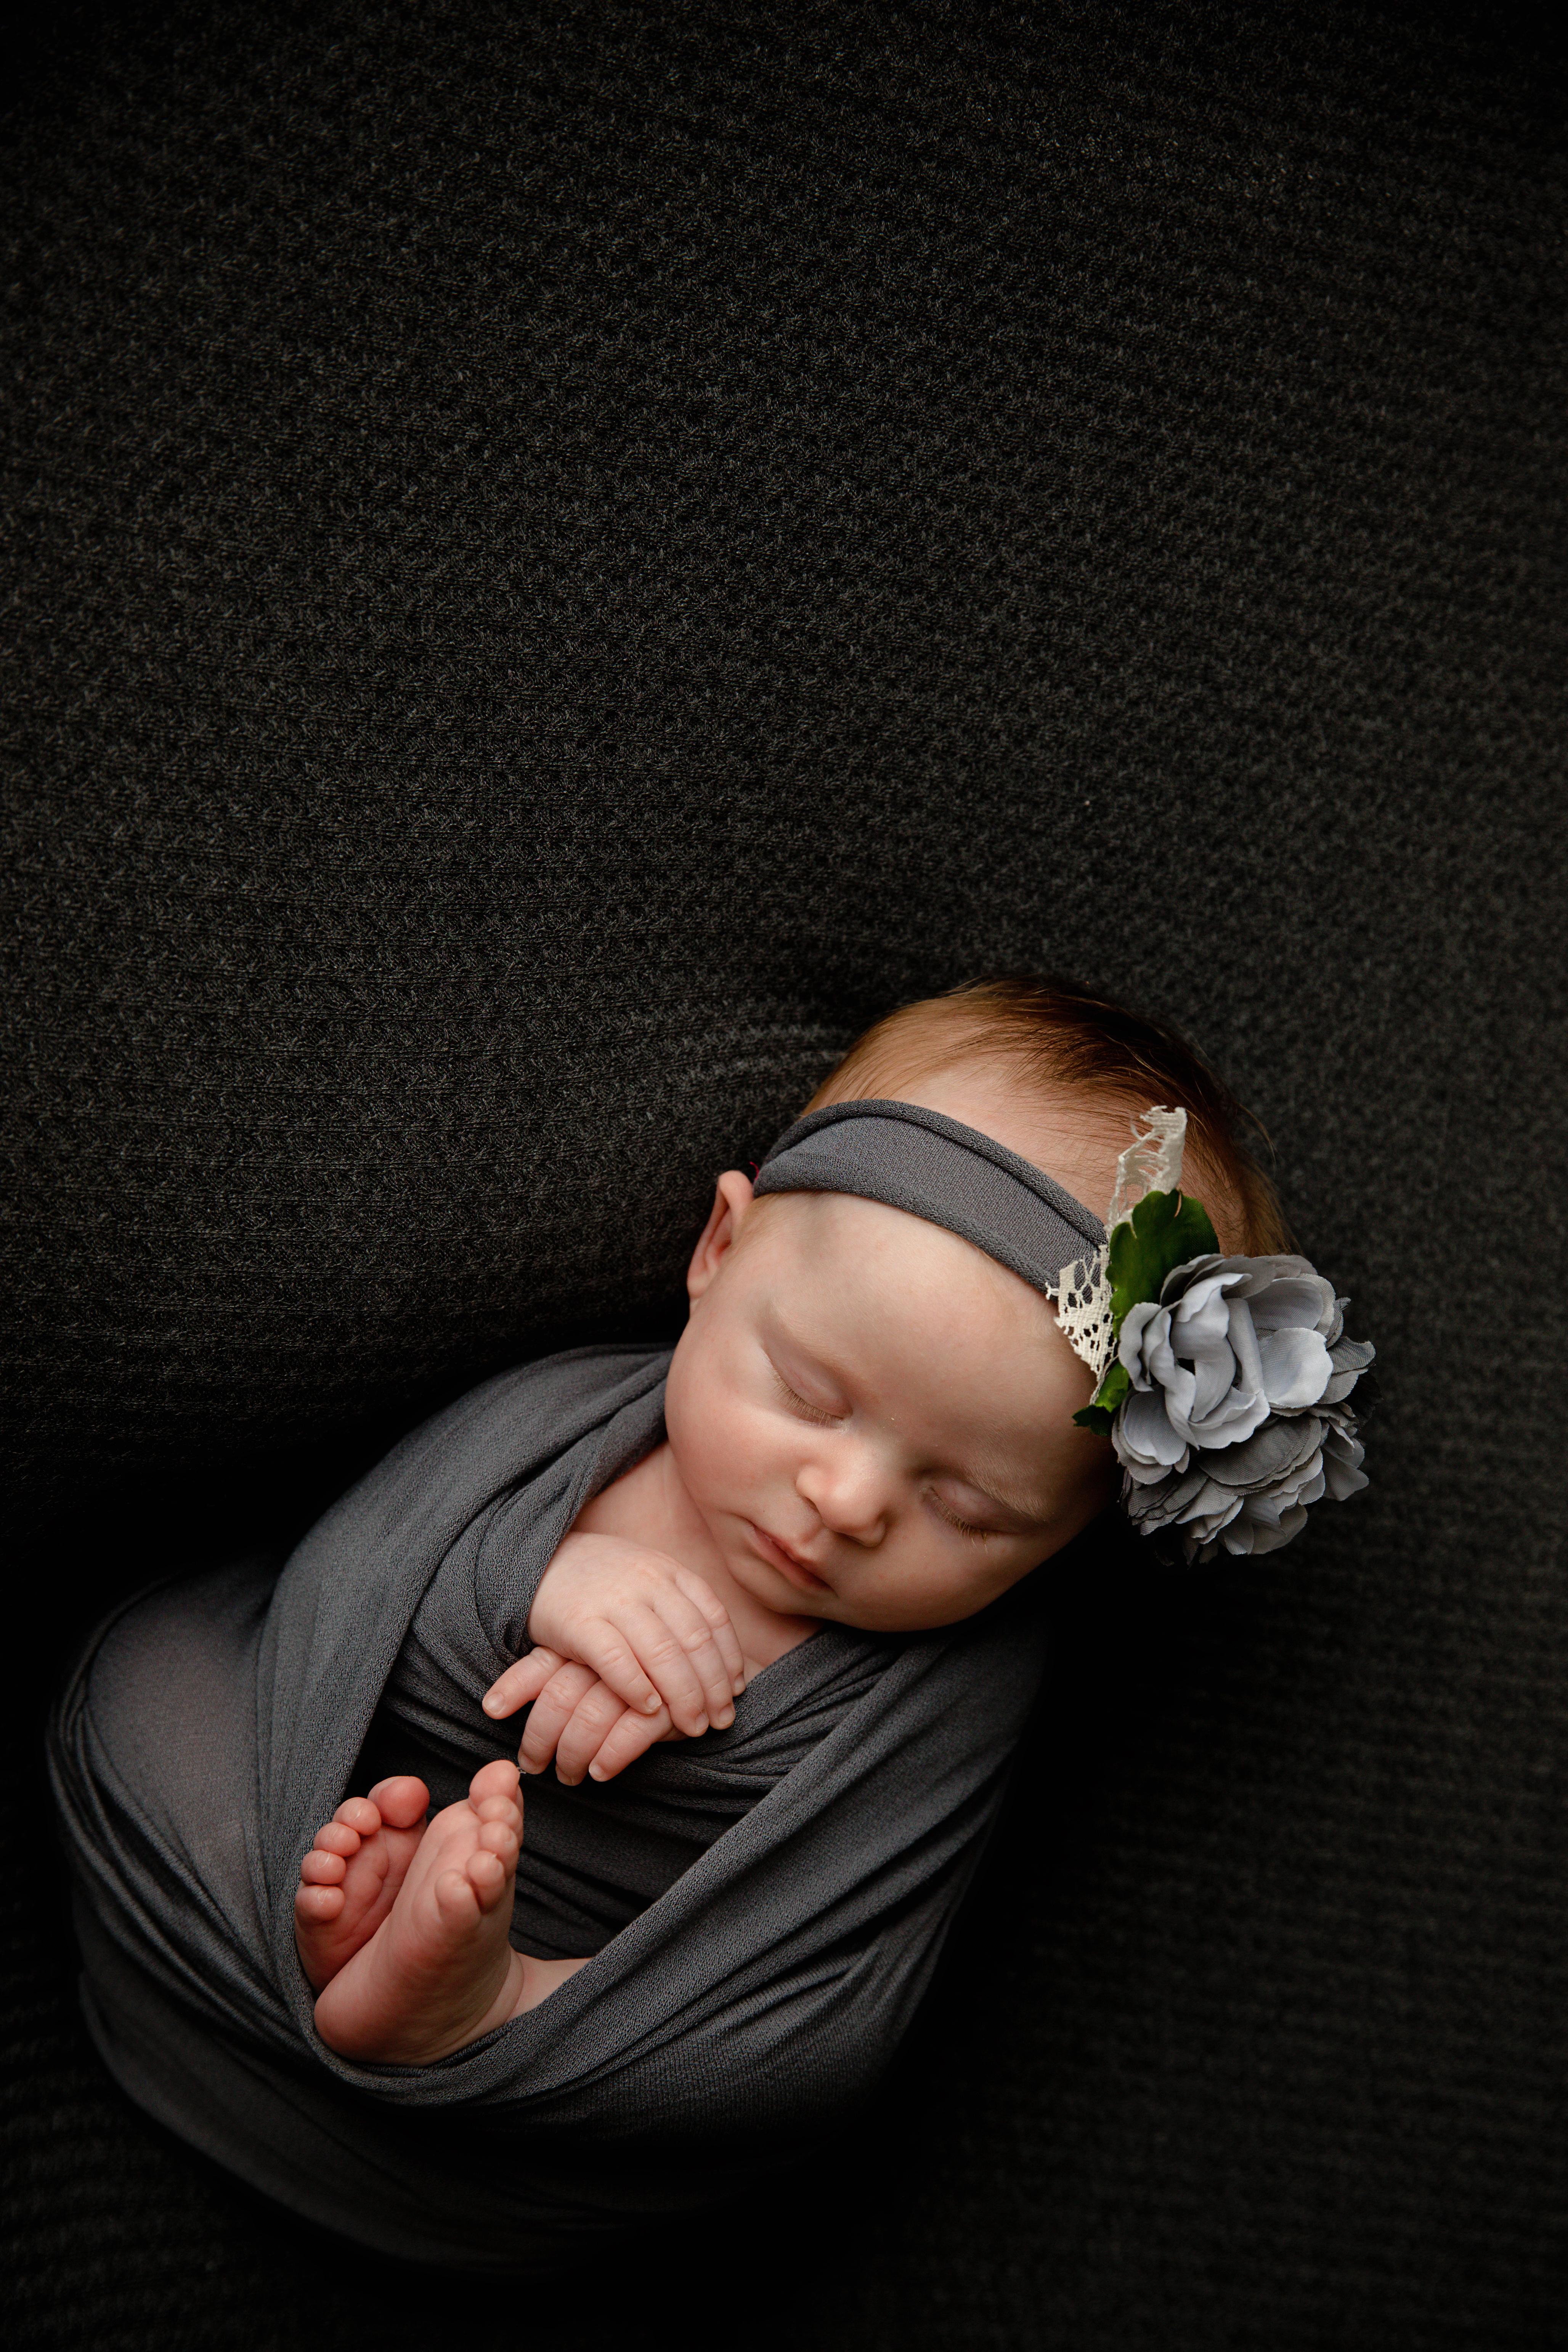 BabyGirl-19041